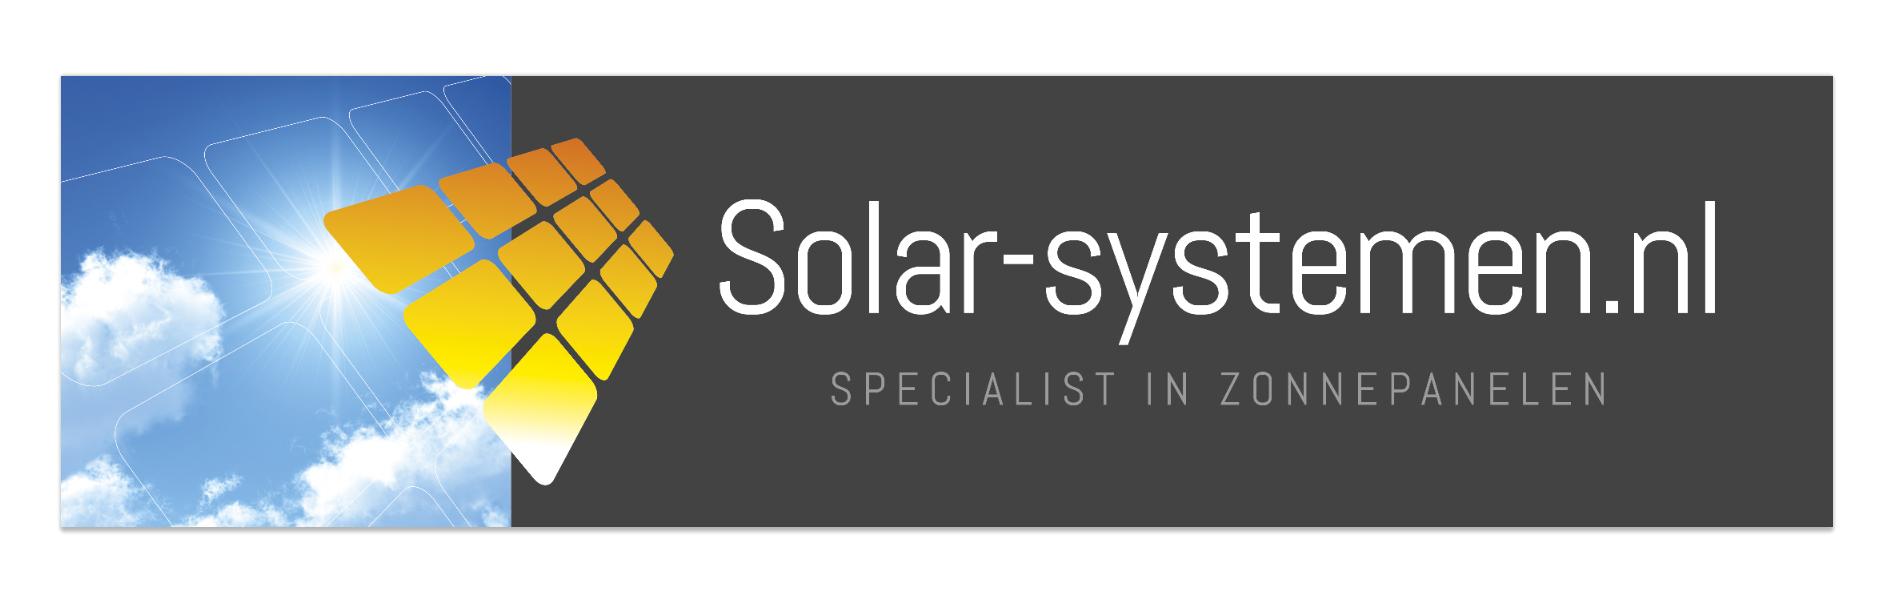 Solar-Systemen.nl Heerlen-Kerkrade